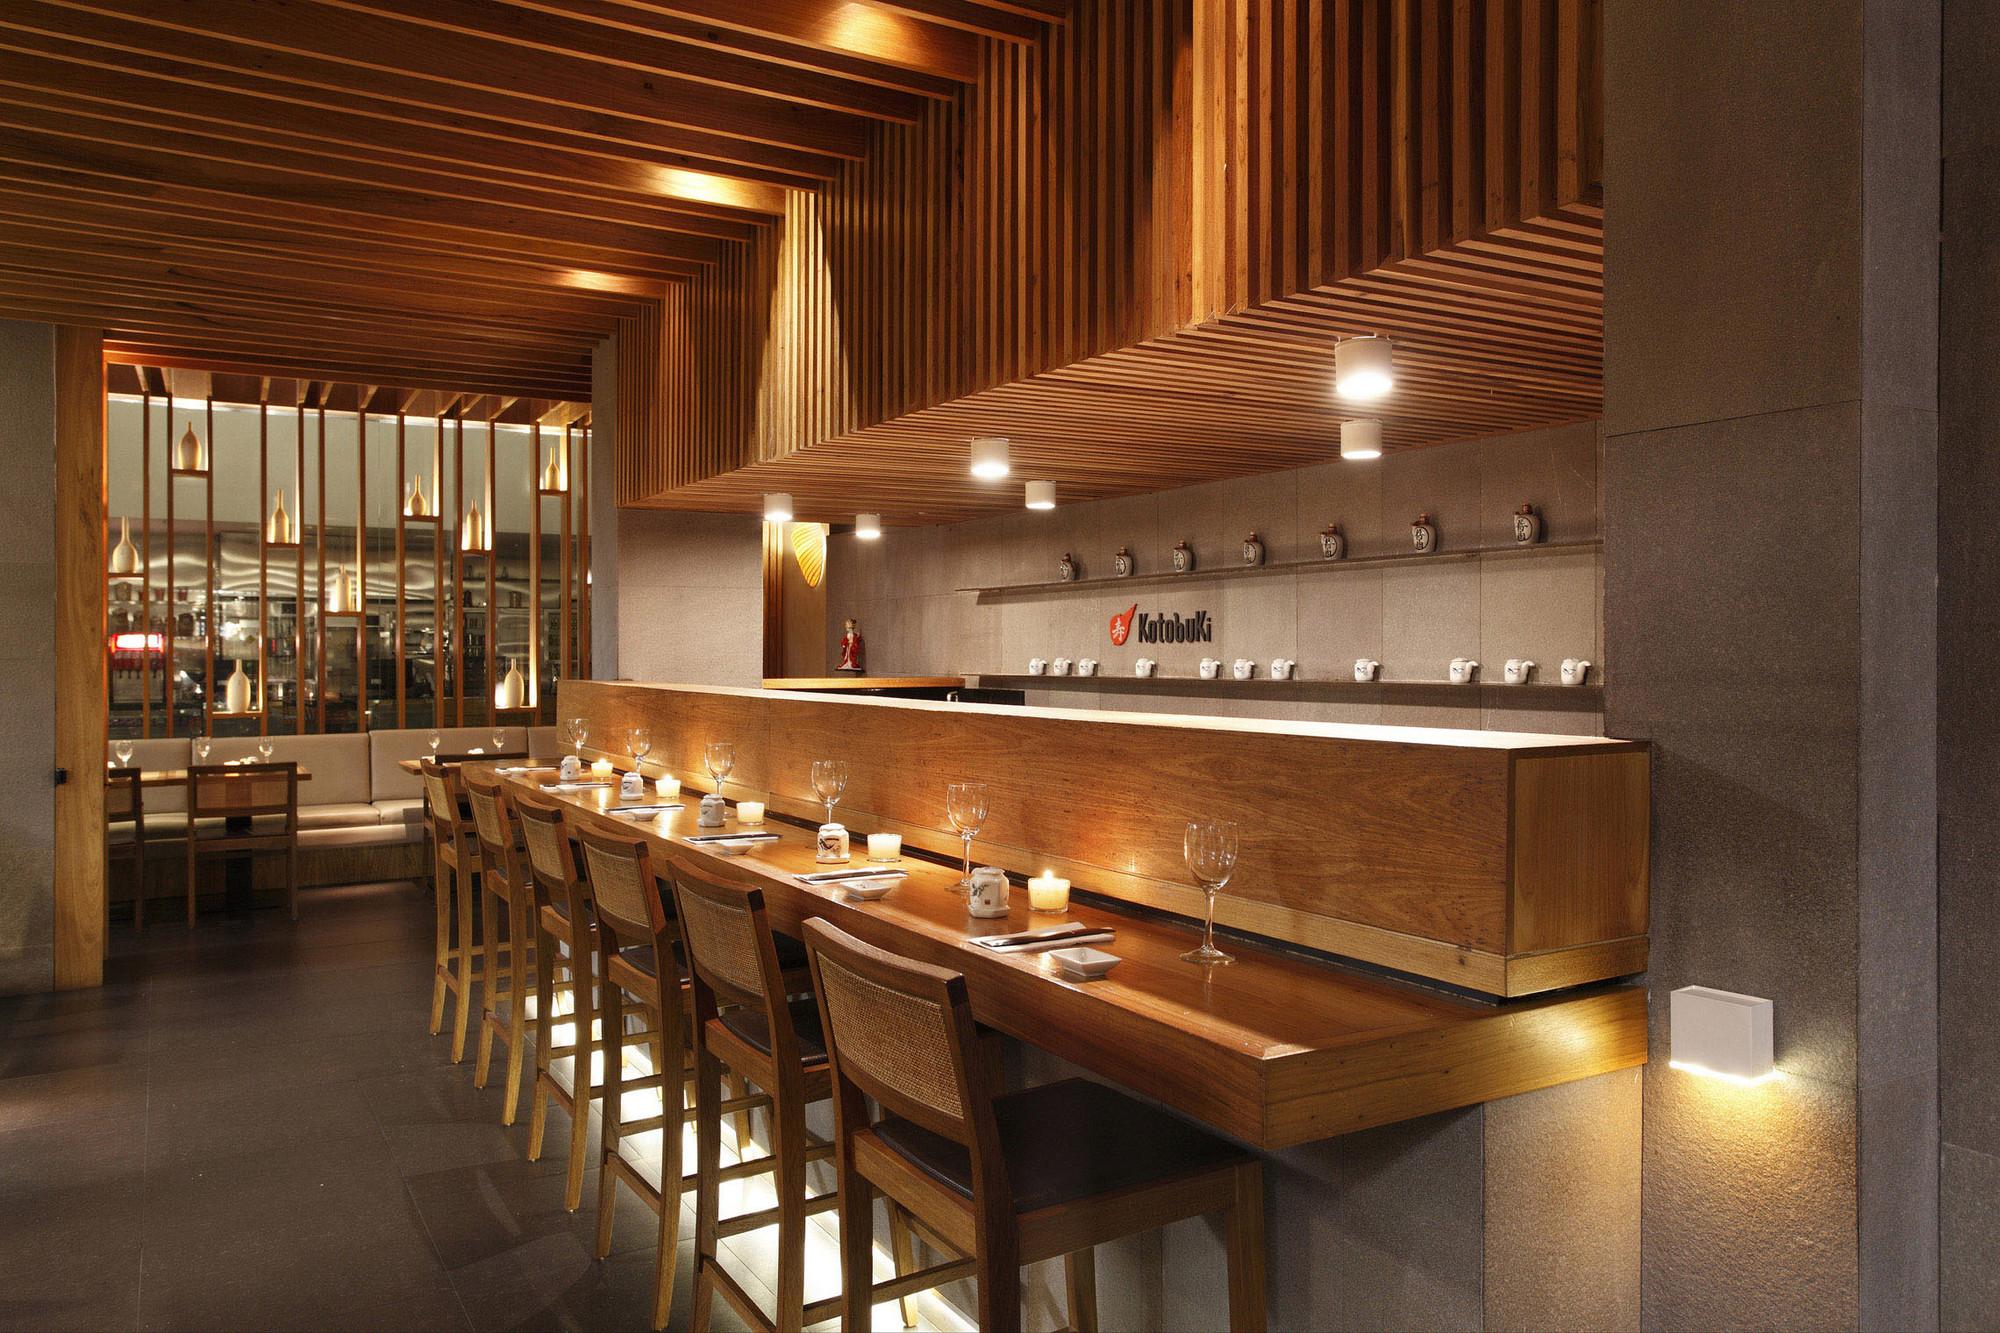 Kotobuki Restaurant / Ivan Rezende Arquitetura, © MCA Studio